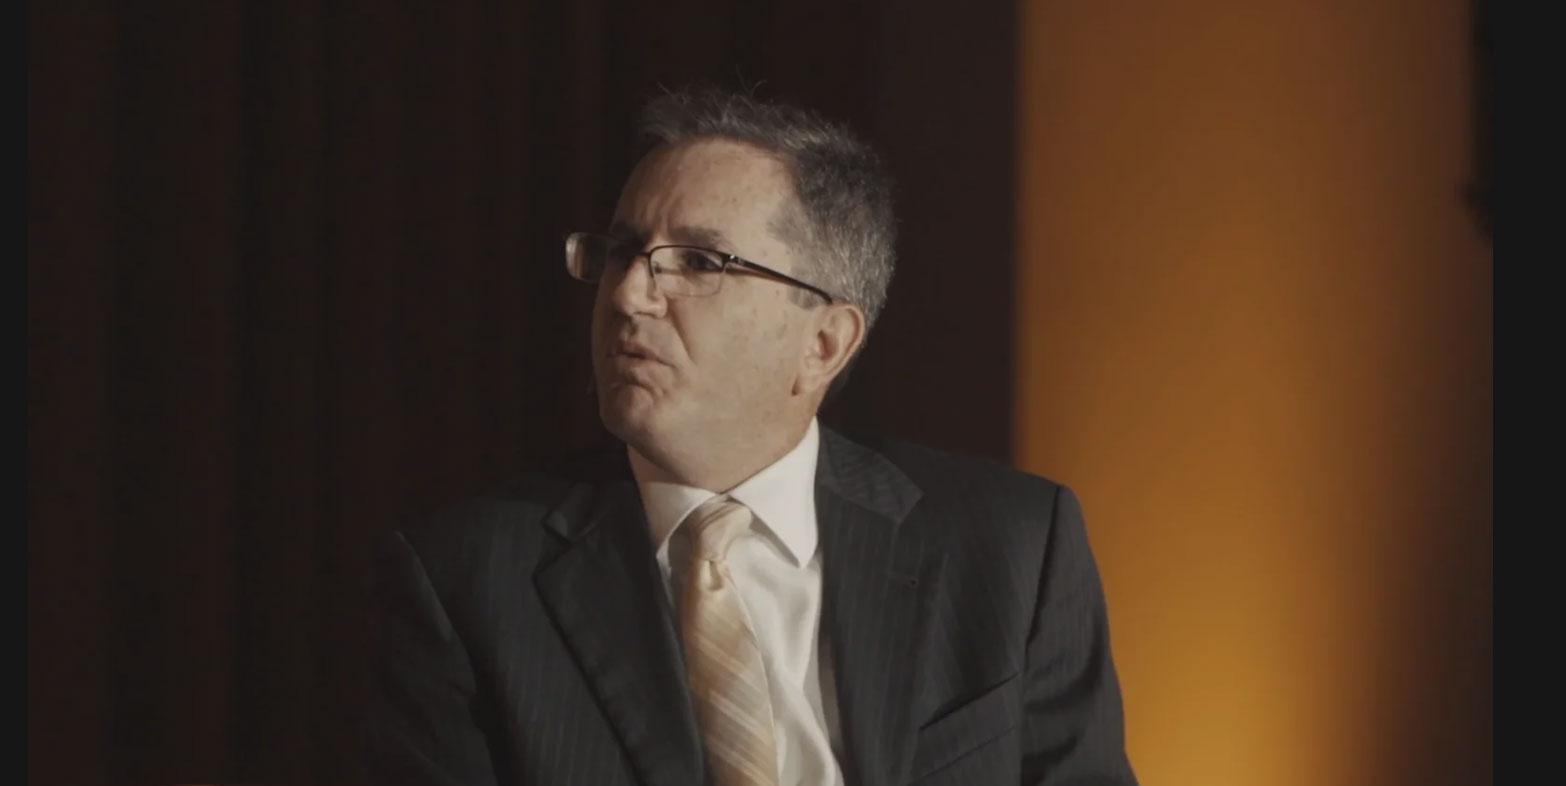 FIBA-Innovation Fusion 2018-Tomer Schatzberger/UC-Care & Dr. Arnie Tannenbaum/Suncoast Urology